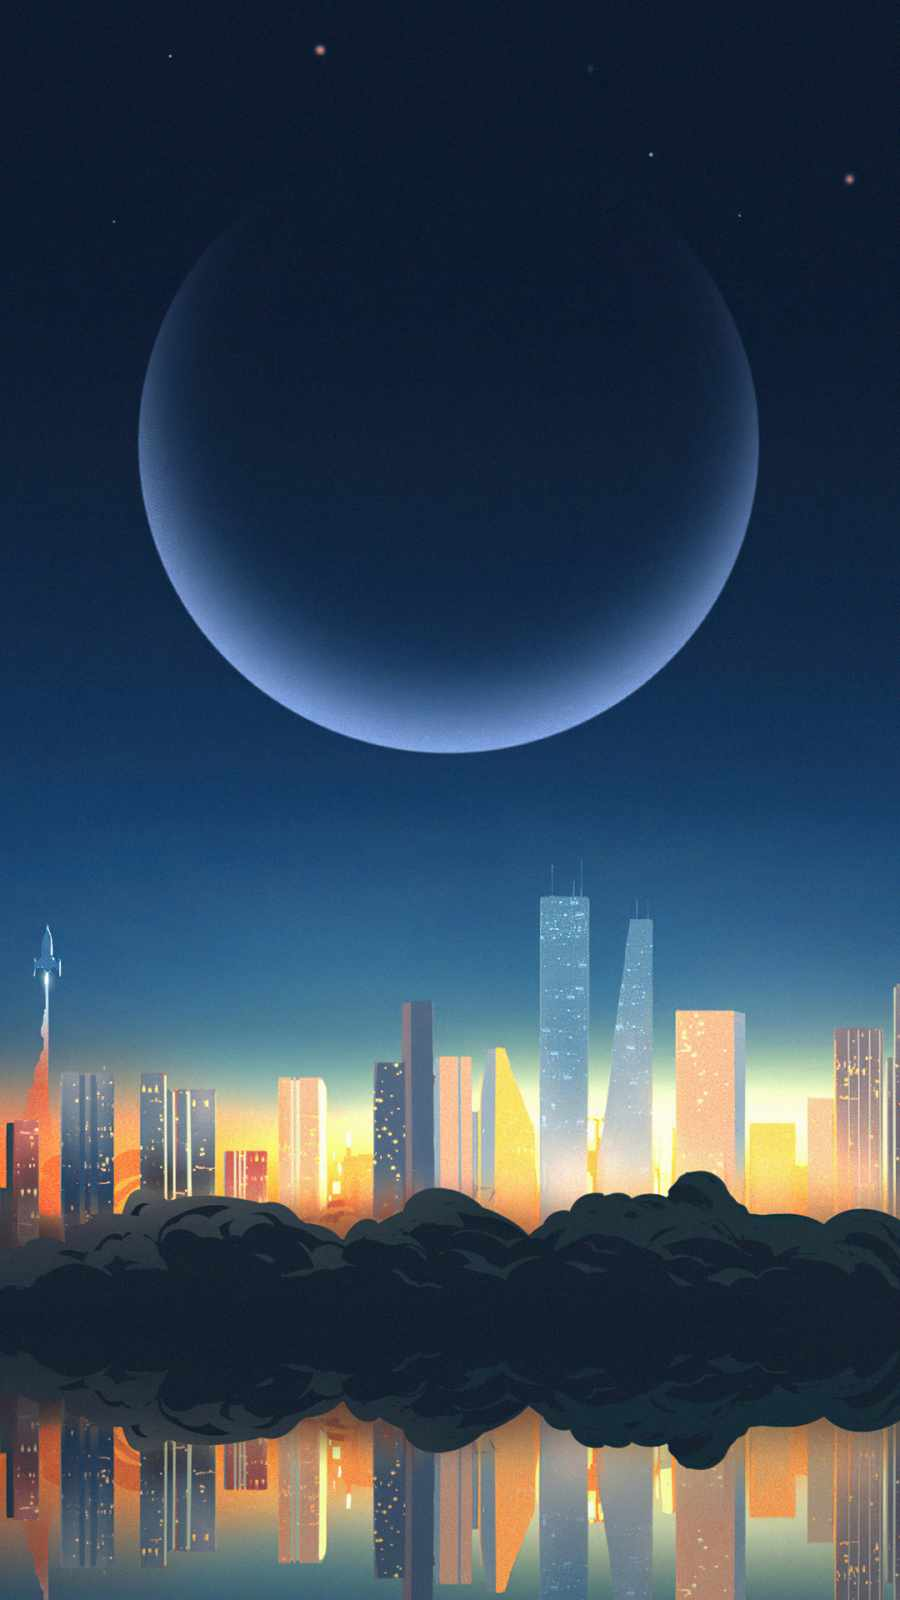 the night cloud city